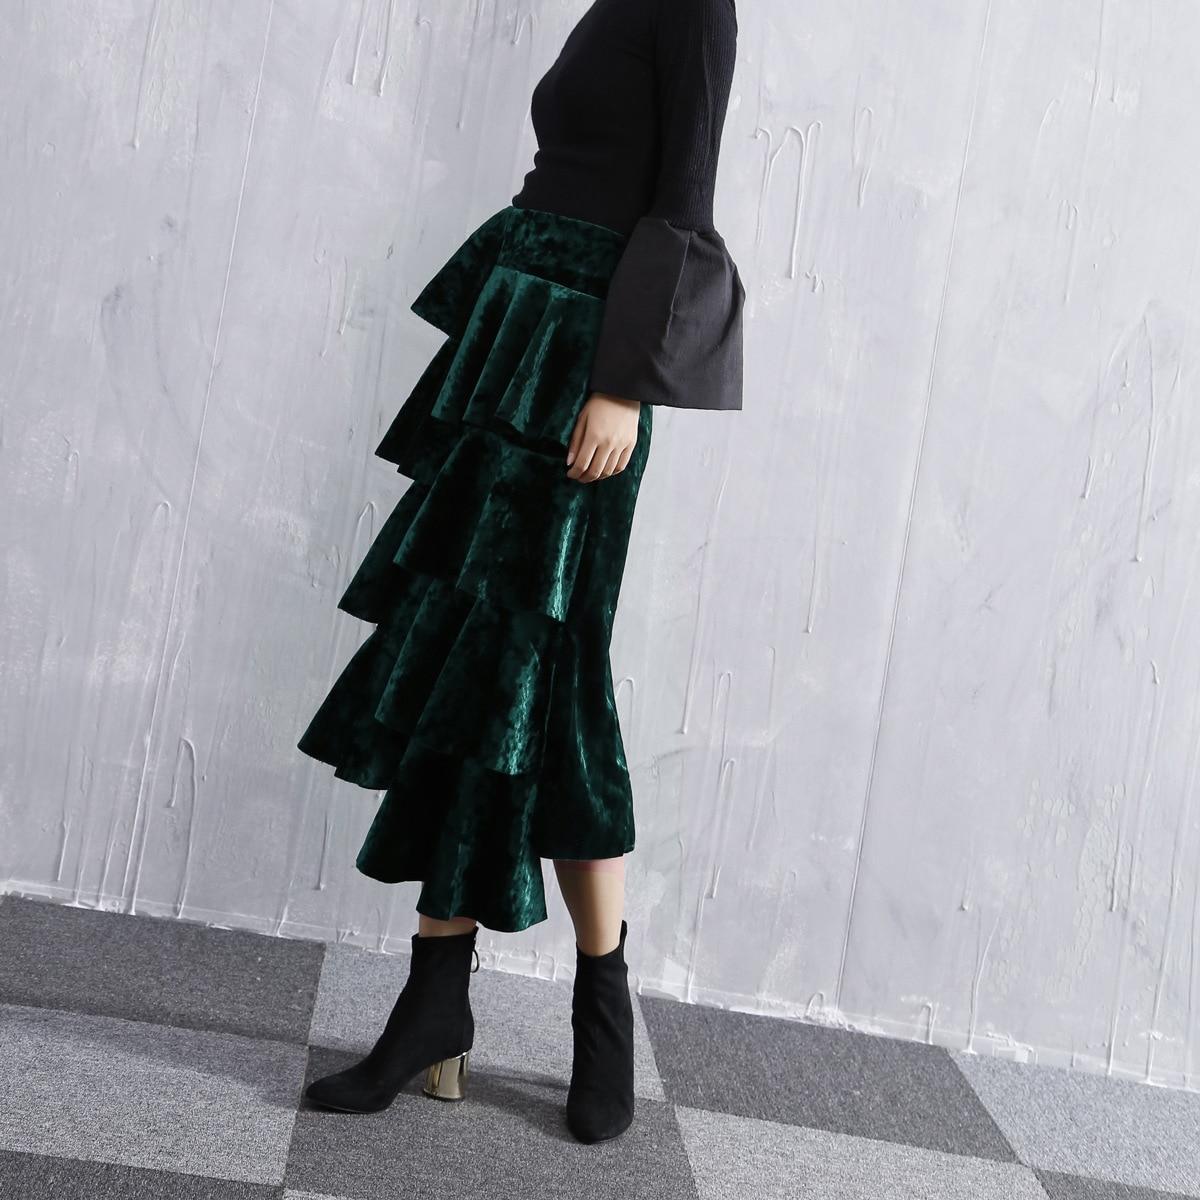 Moda Otoño 2018 Qd691 Alta Falda negro Velvet Vintage Green Mujer Faldas Cintura Cake Longitud Invierno Mediados De Asimétrico 6wqrwdF